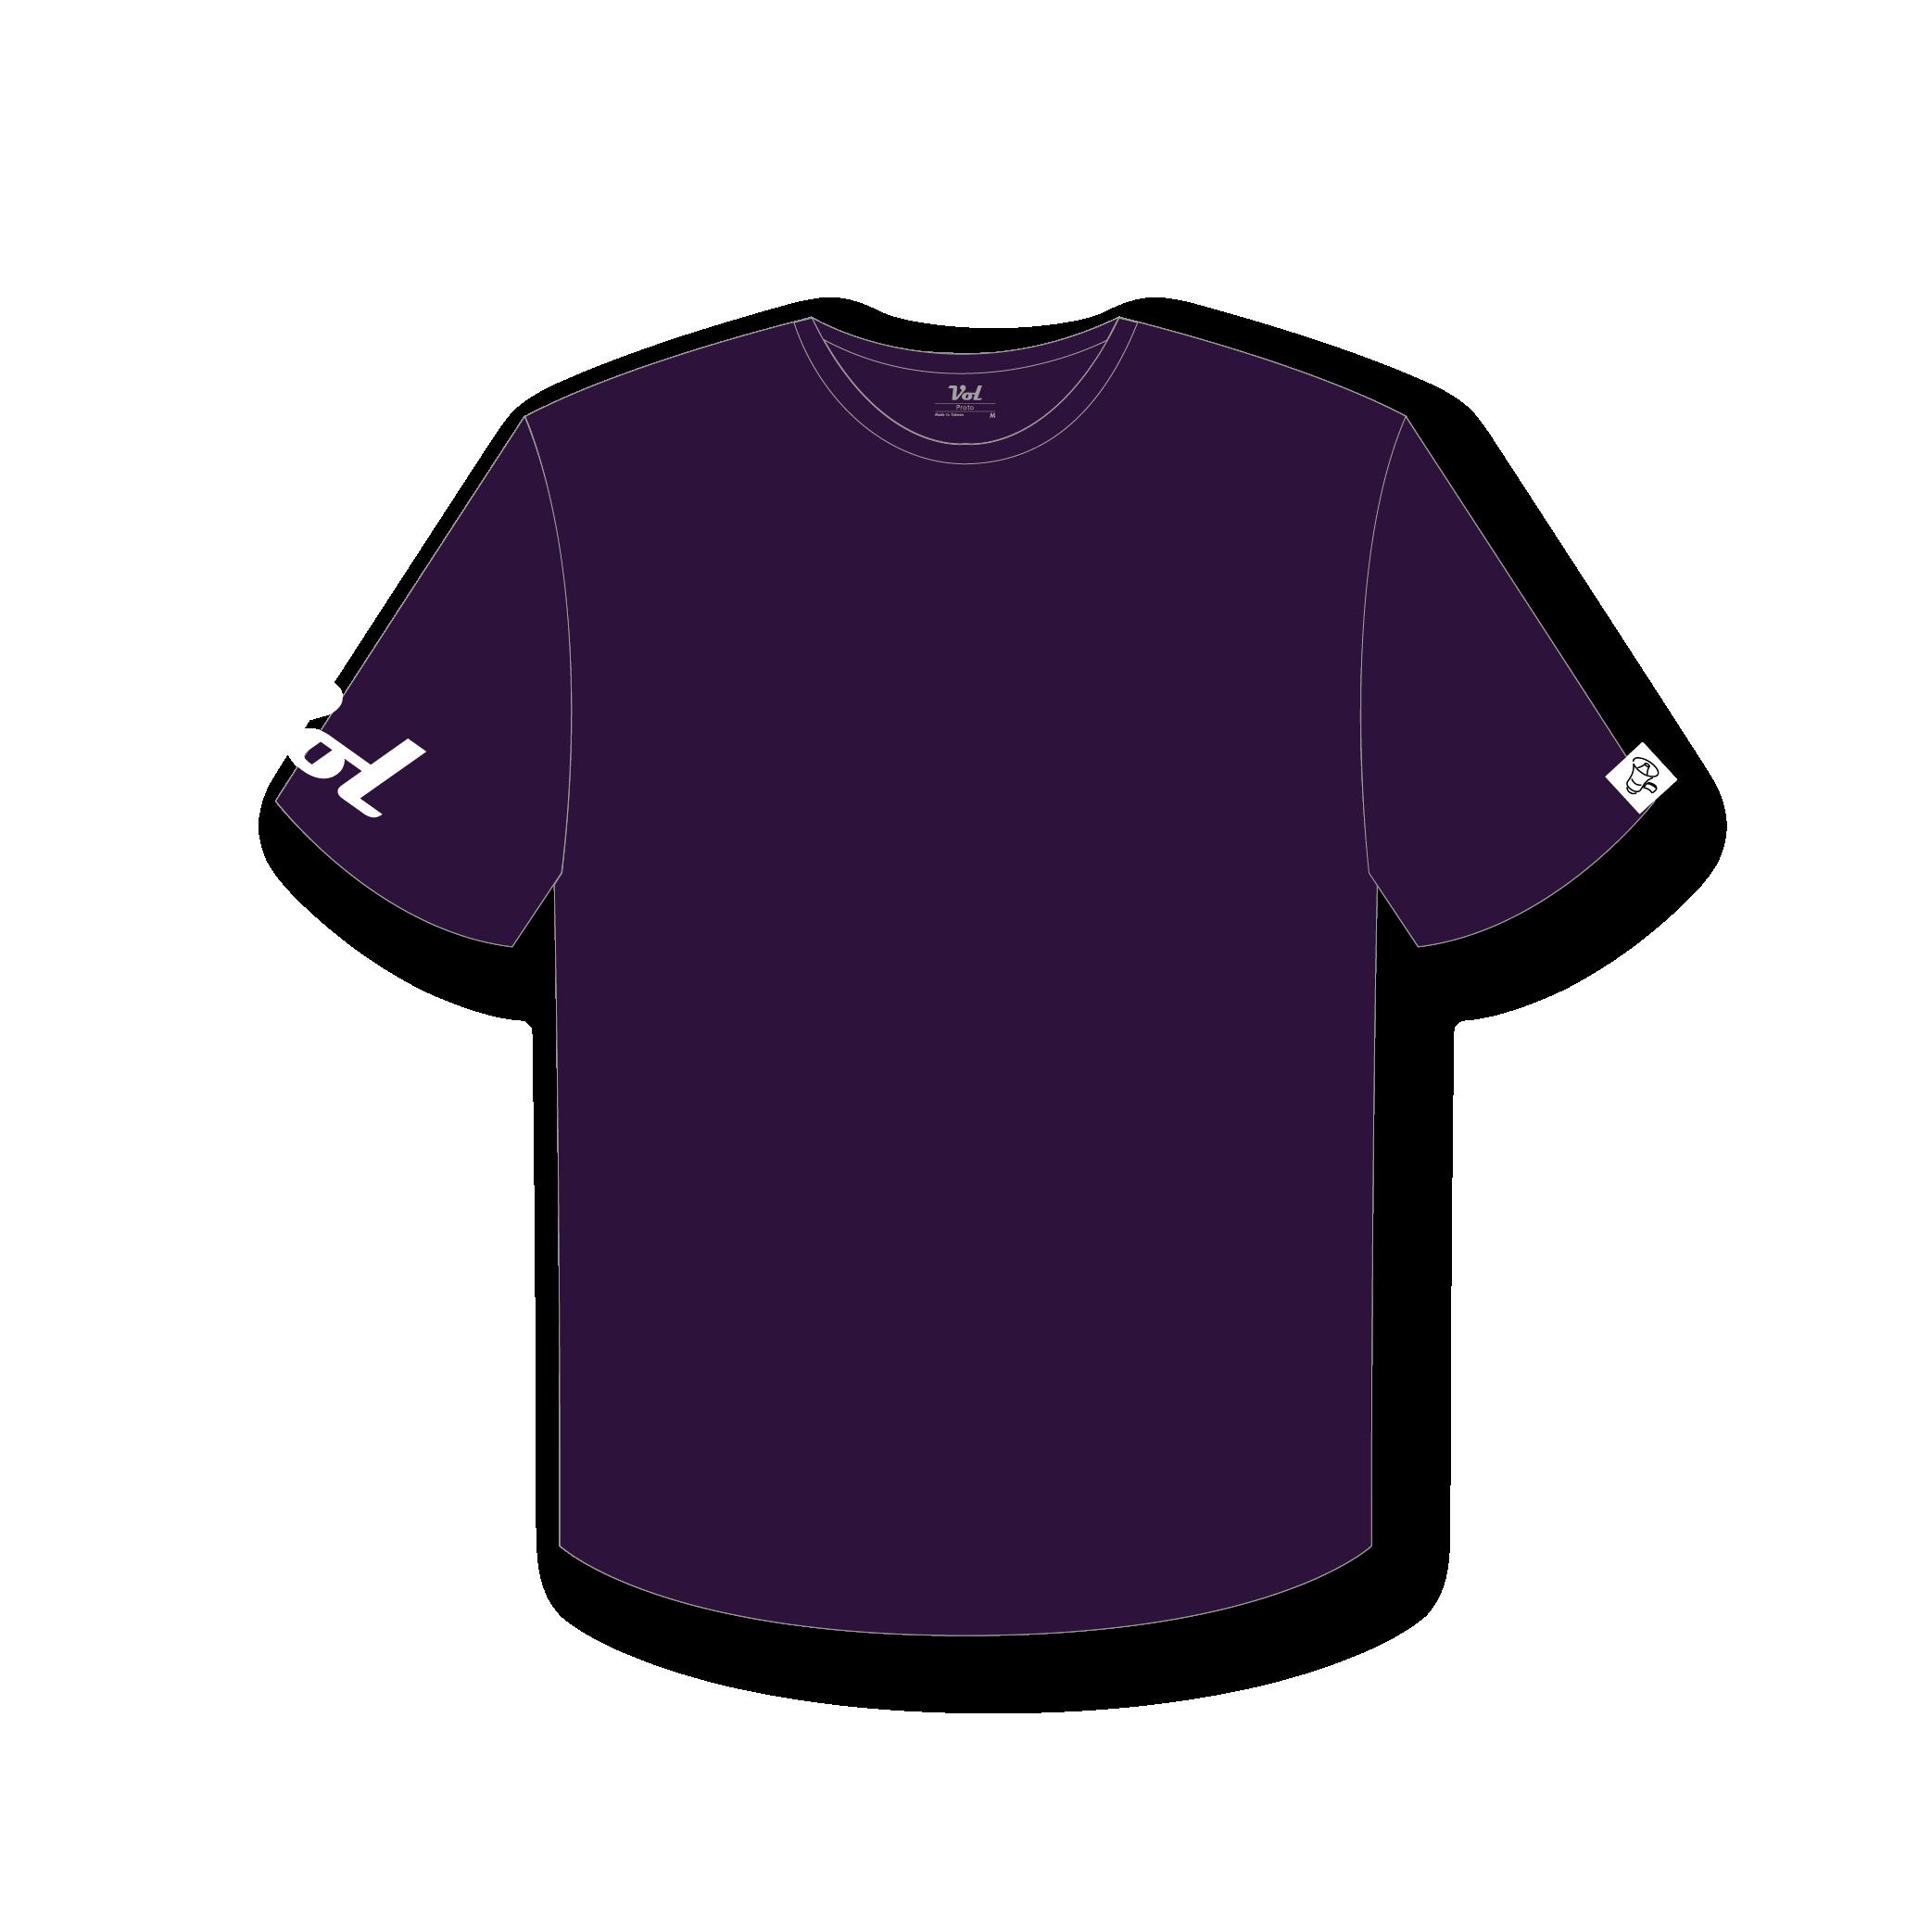 shirt-front